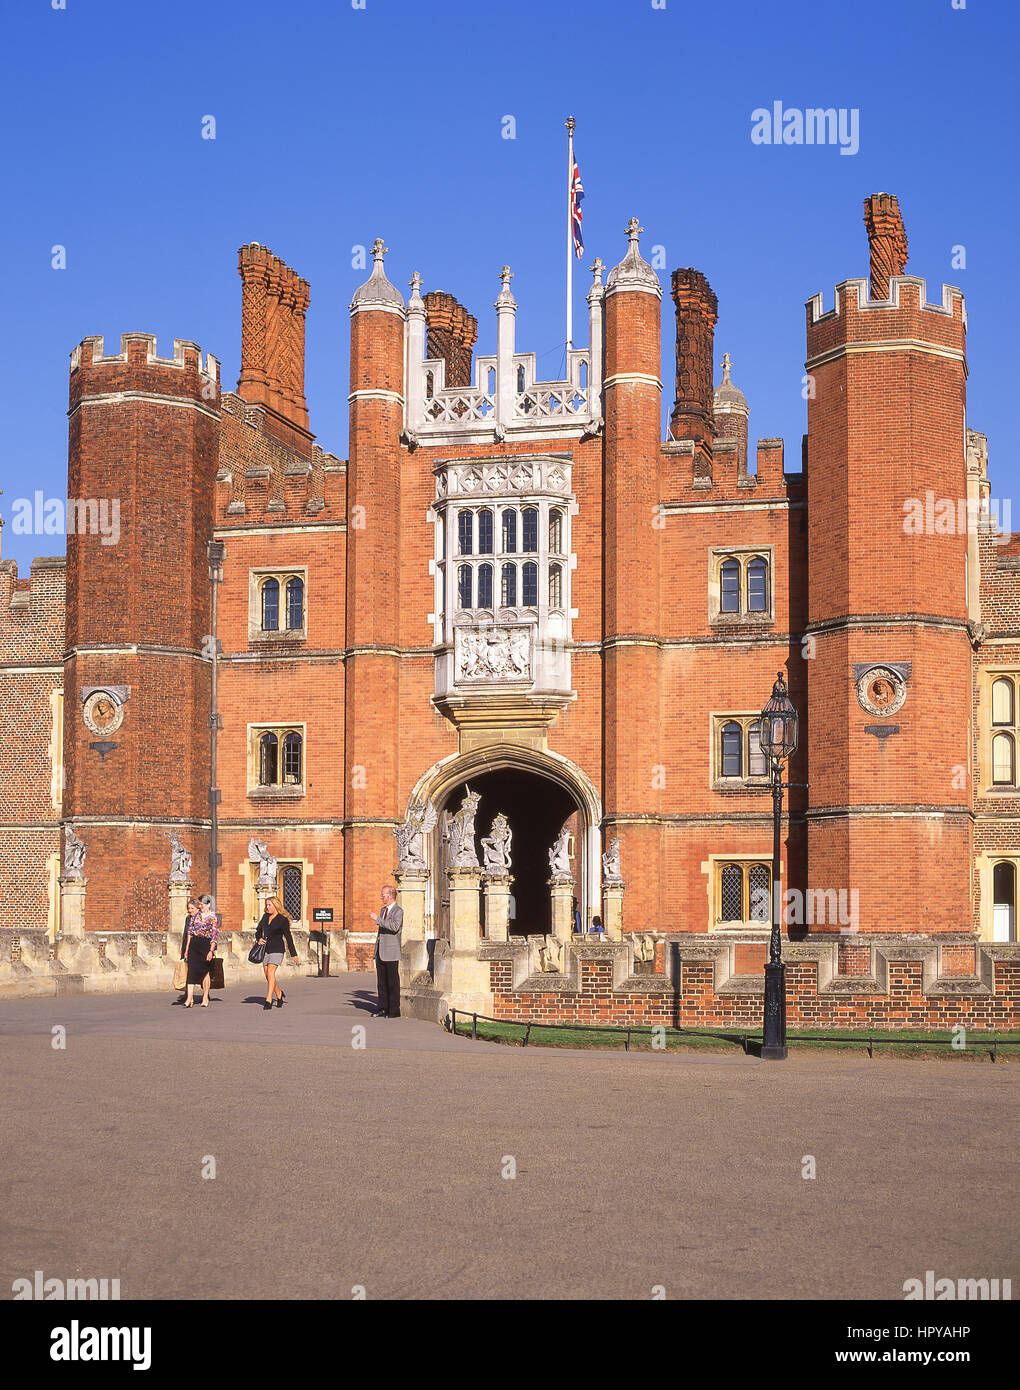 The Great Gatehouse Hampton Court Palace, Hampton, London Borough of Richmond upon Thames, Greater London, England, - Stock Image